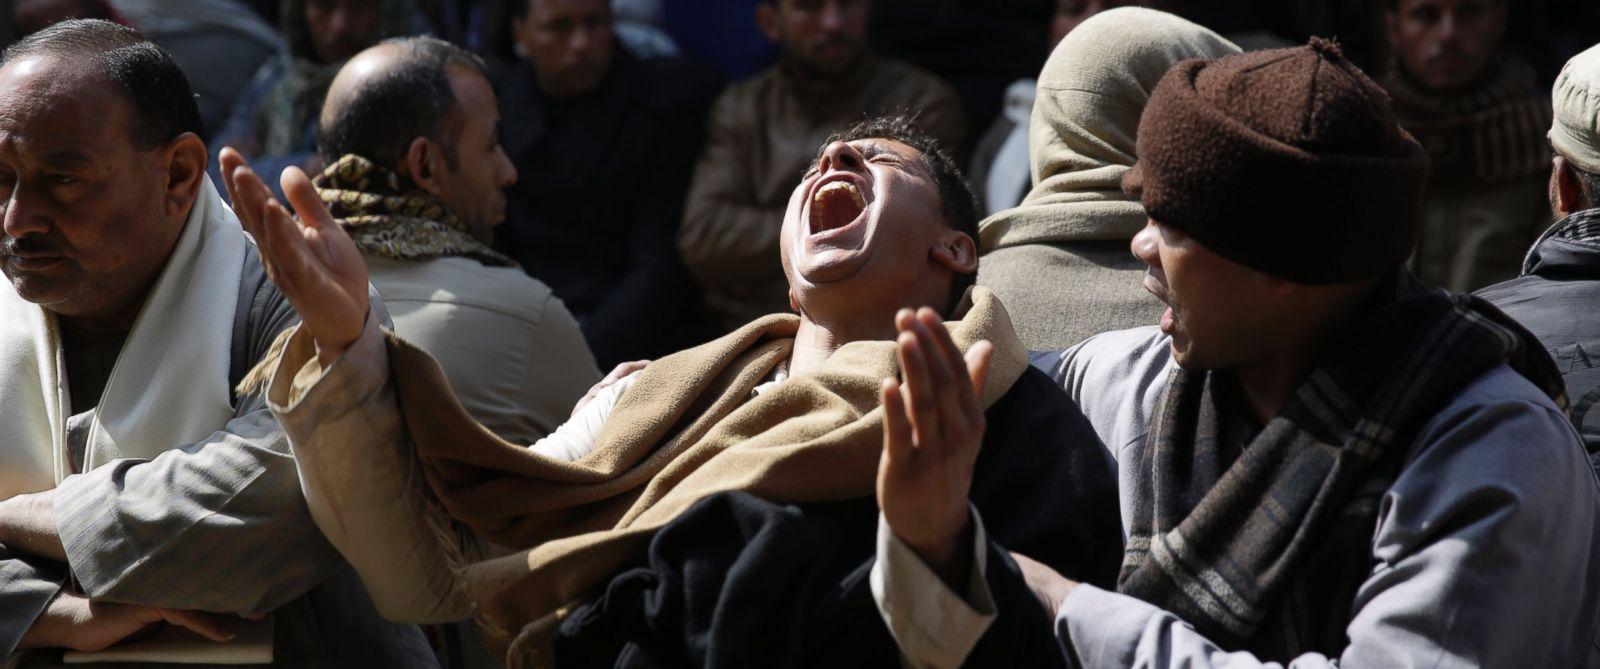 PHOTO: Egyptian Coptic men mourn for 21 Coptic Egyptian men seized by Islamic State militants